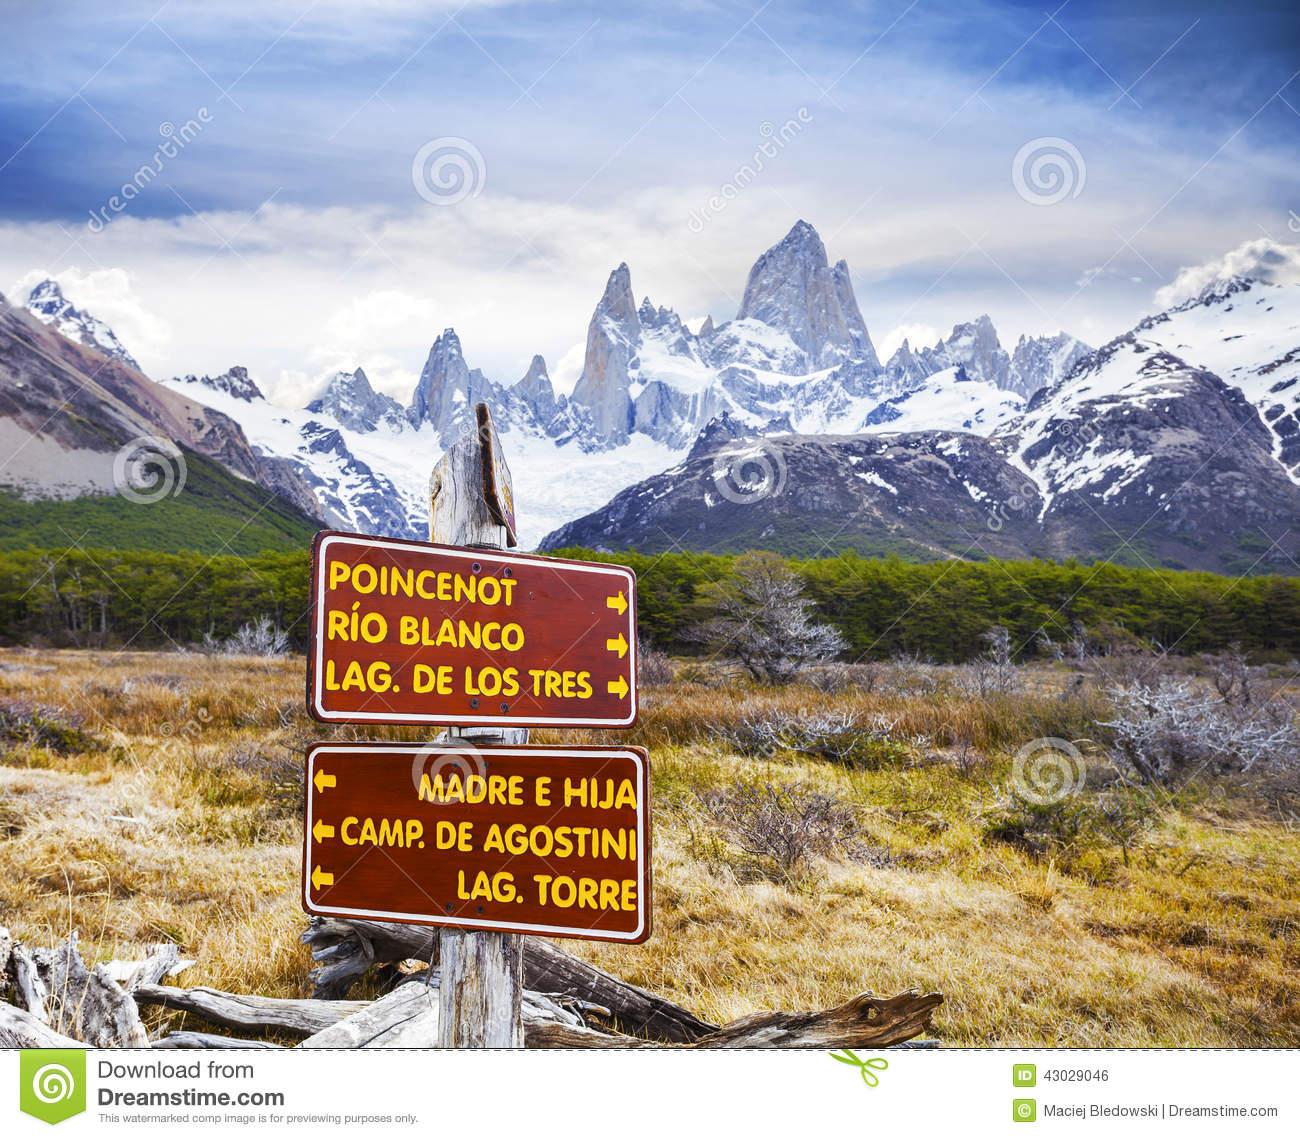 Los Glaciares National Park clipart #20, Download drawings